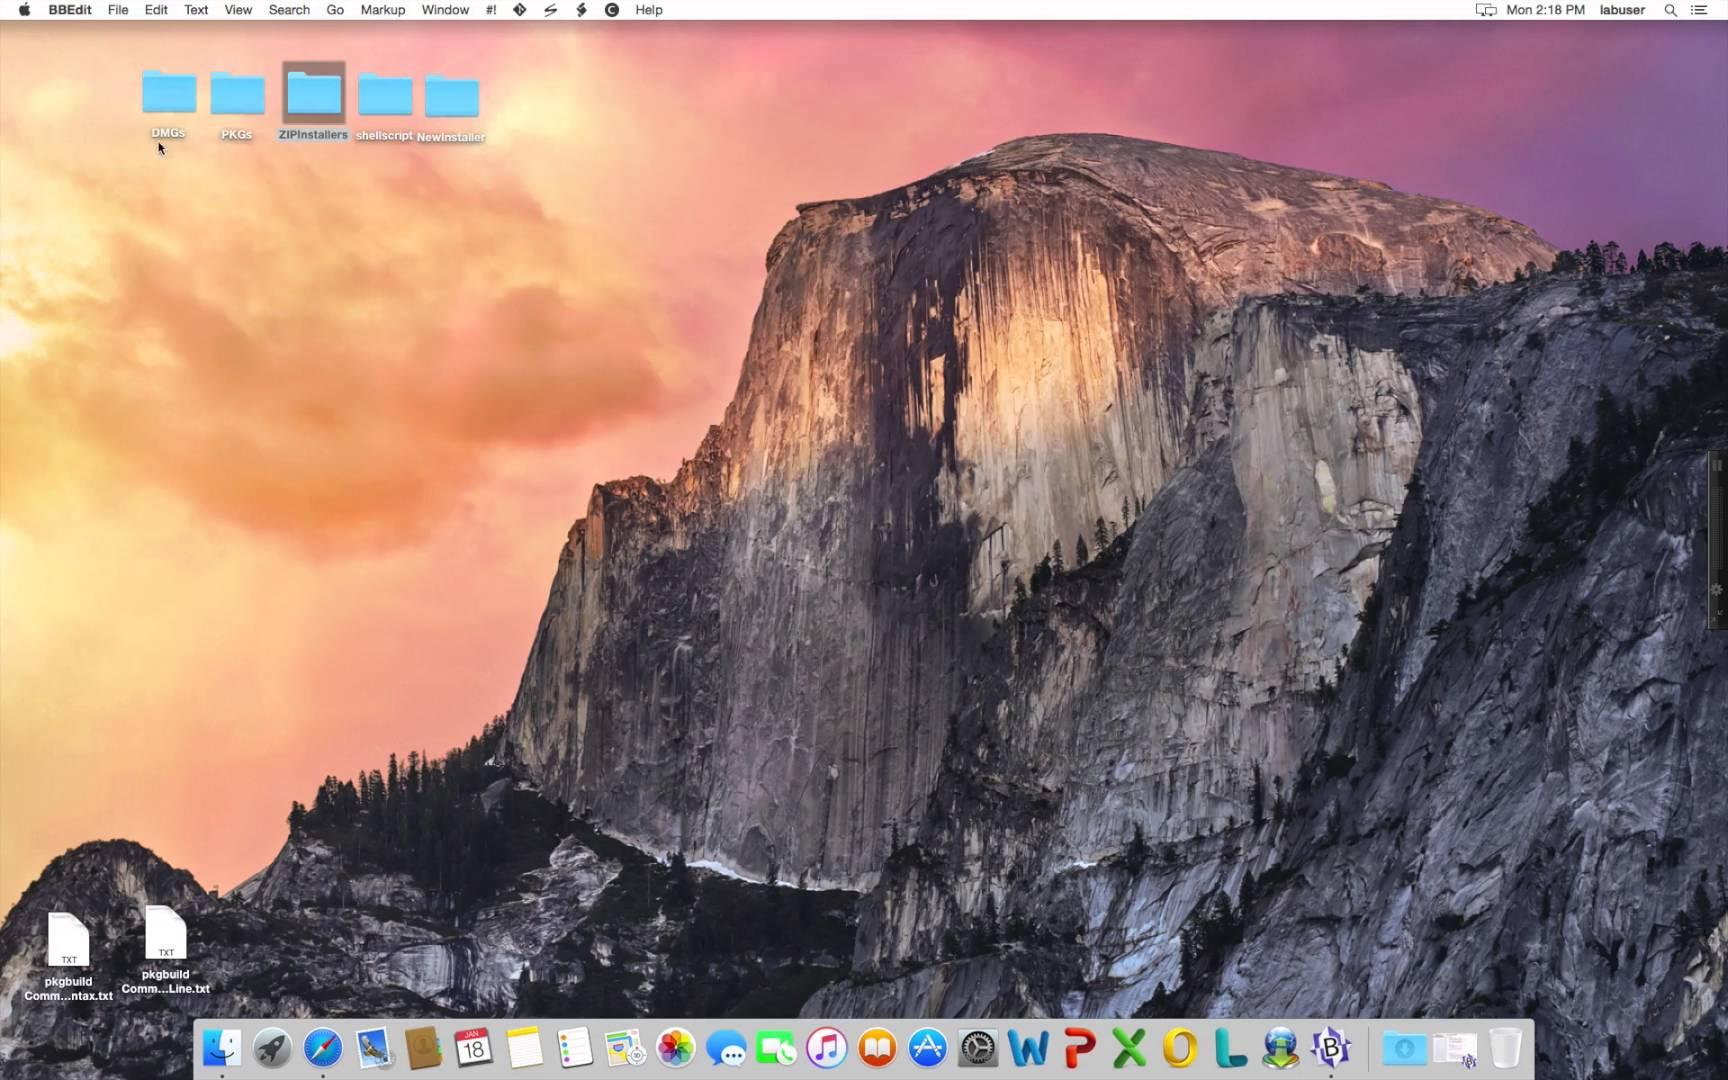 Adobe Acrobat Pro DC 2015.020.20042 MacOSX Free Download